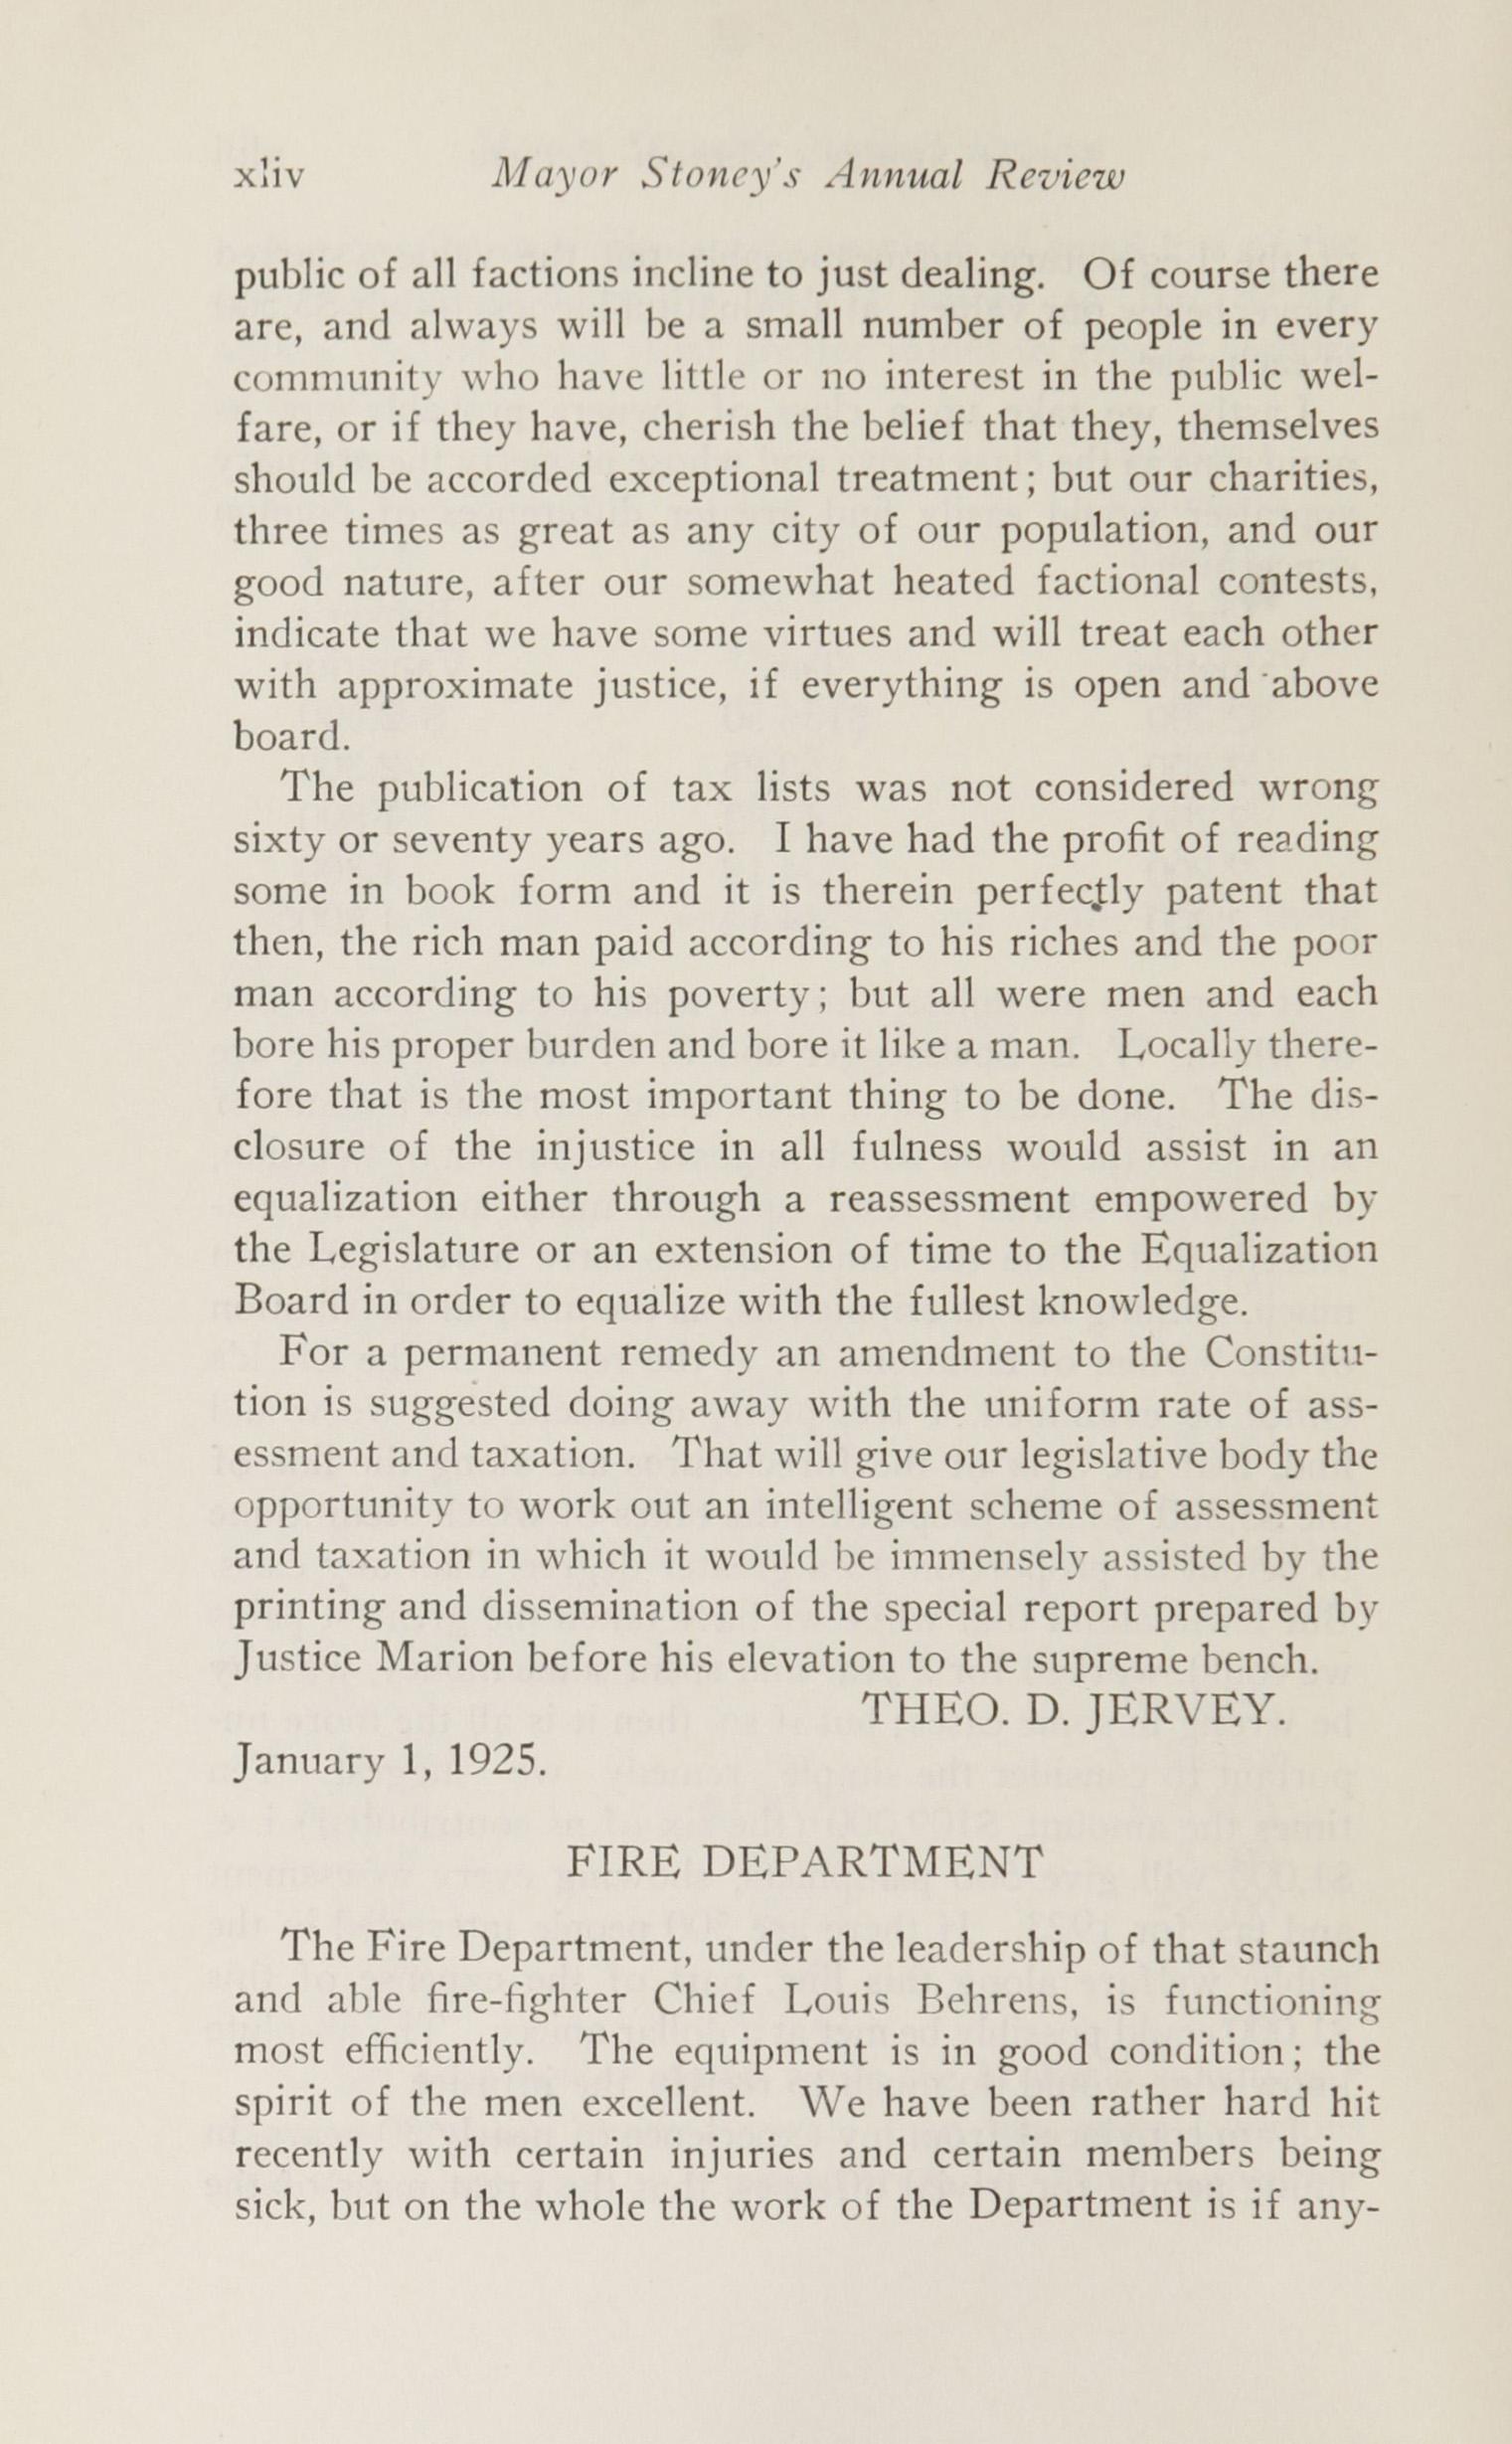 Charleston Yearbook, 1924, page xliv